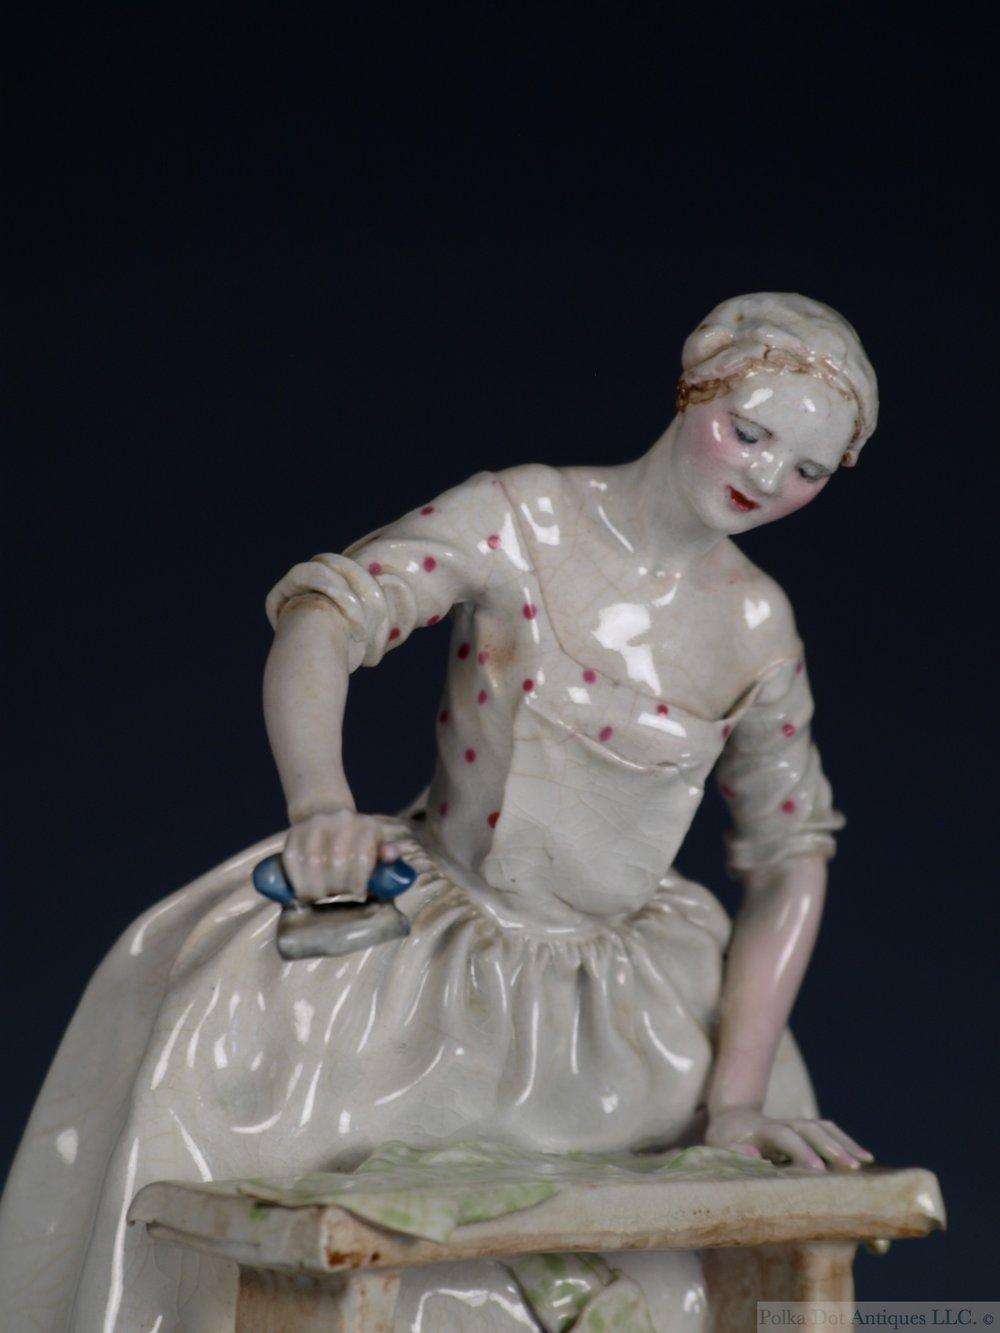 rw1257 G. Parnell Ironing Figure - 3.jpg